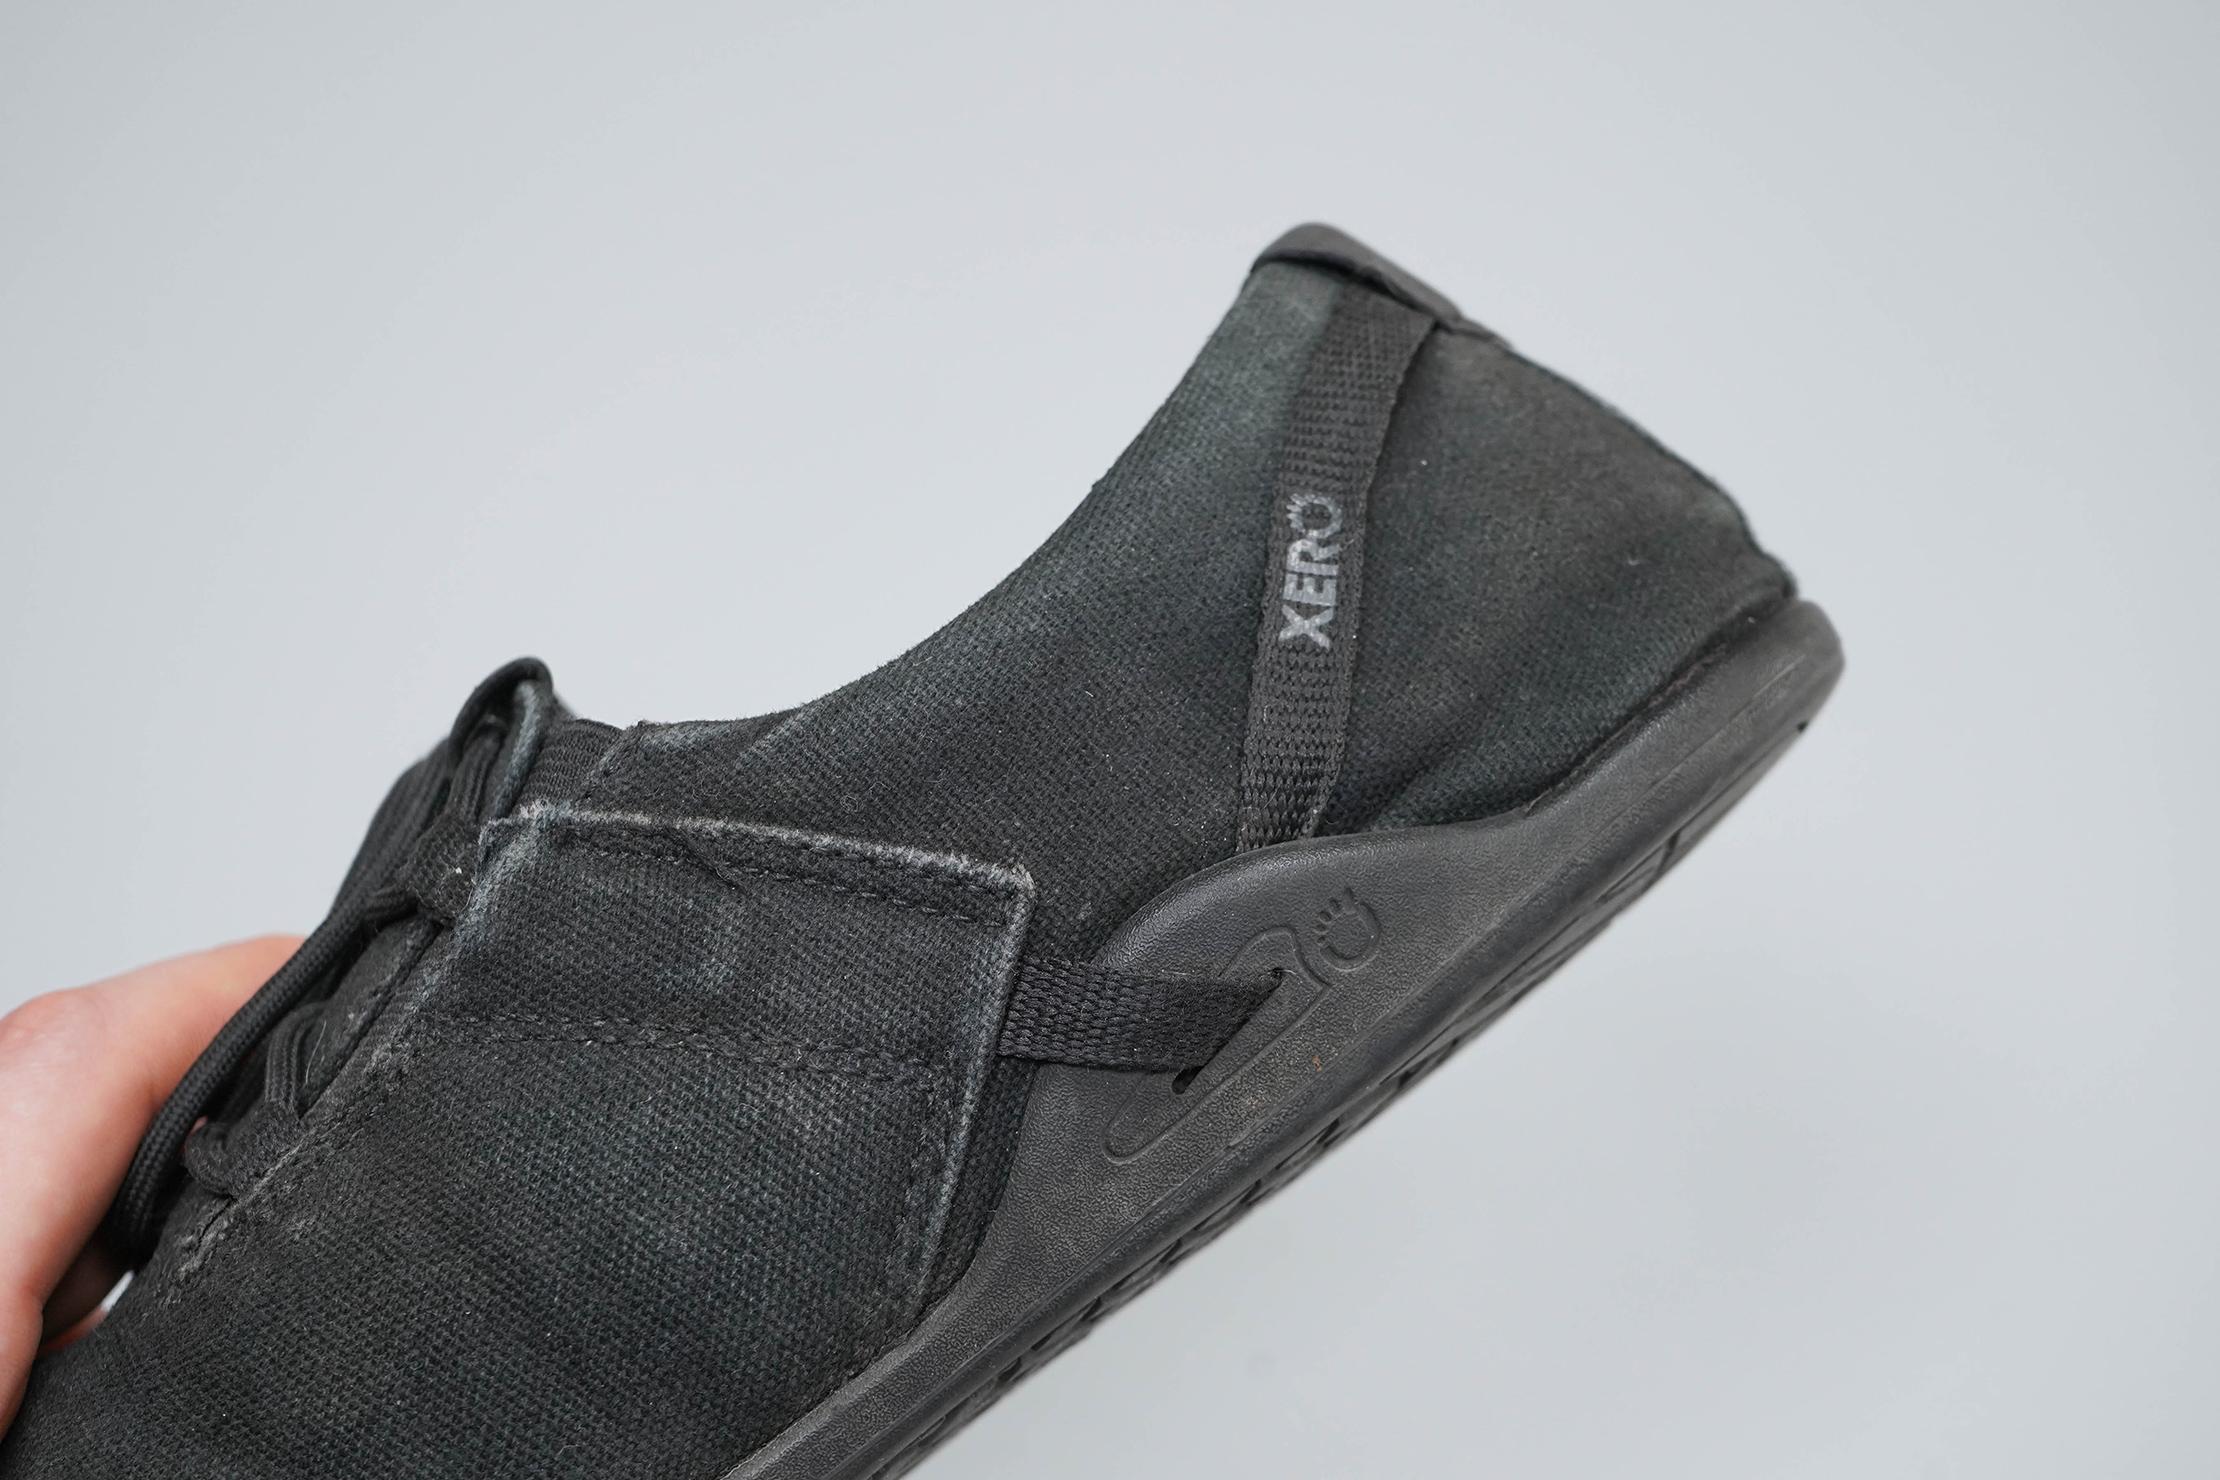 Xero Shoes Hana Men's Heel Strap